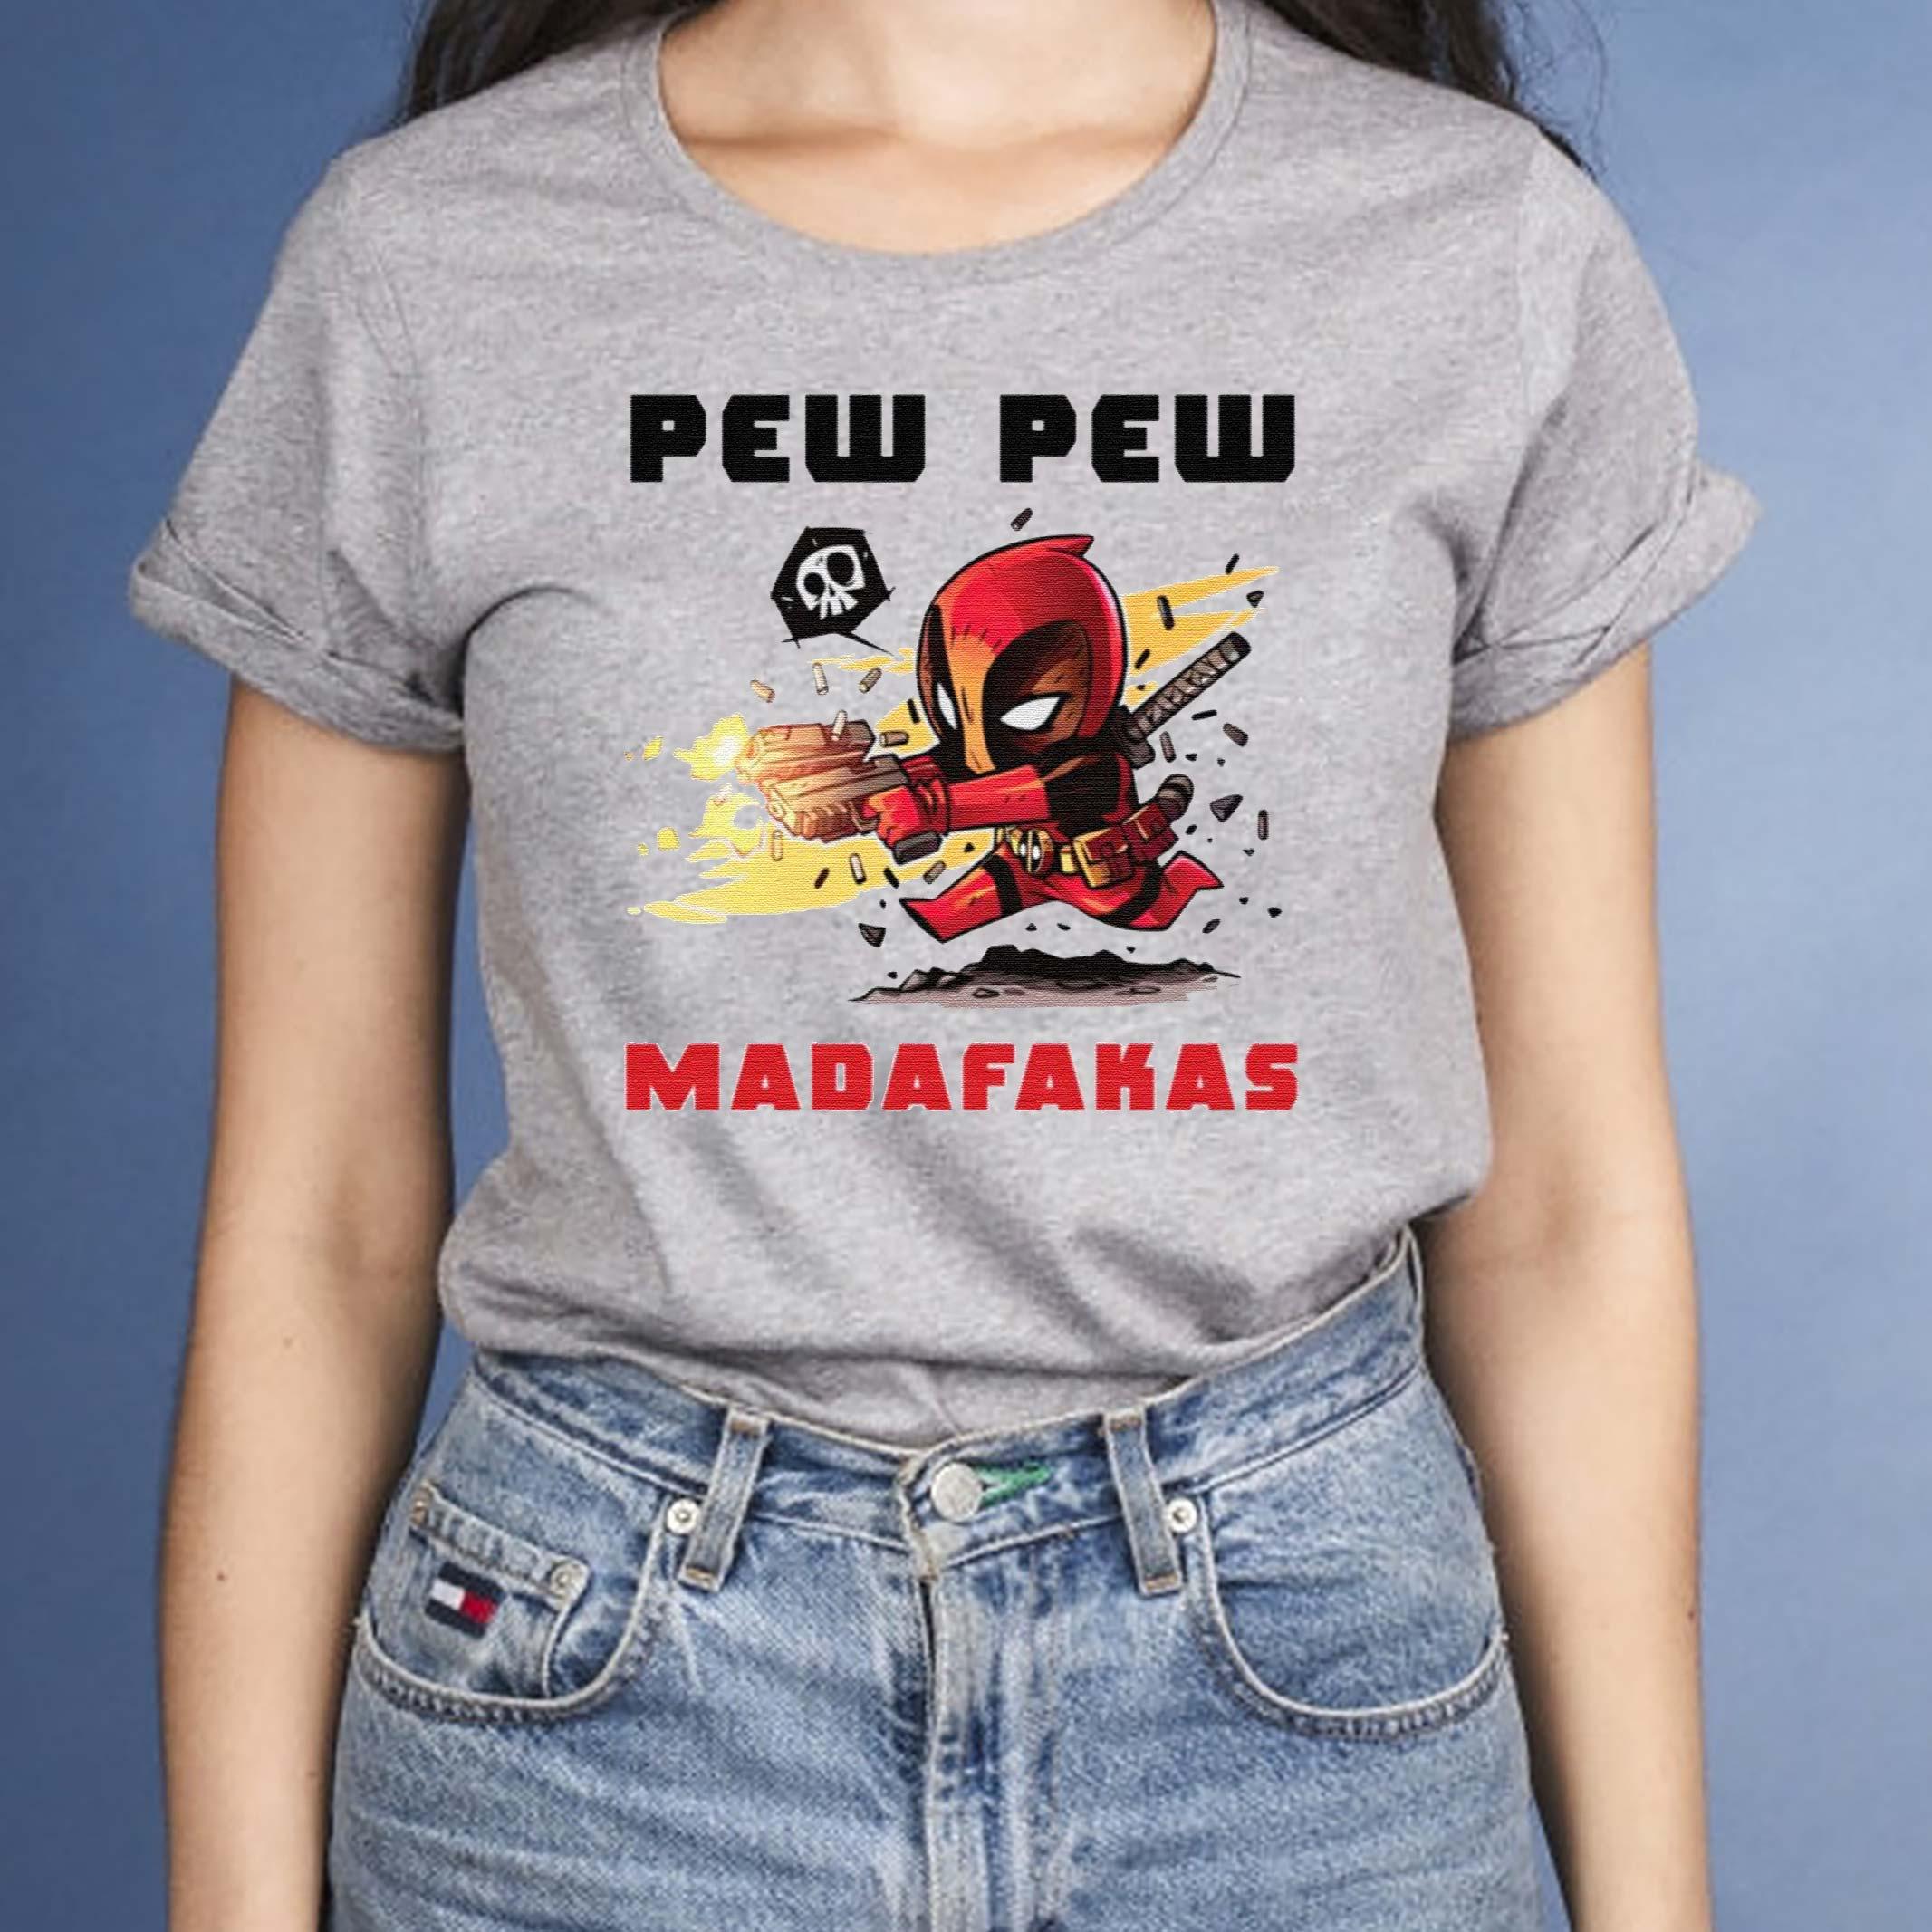 Deadpool-Pew-Pew-Madafakas-shirts